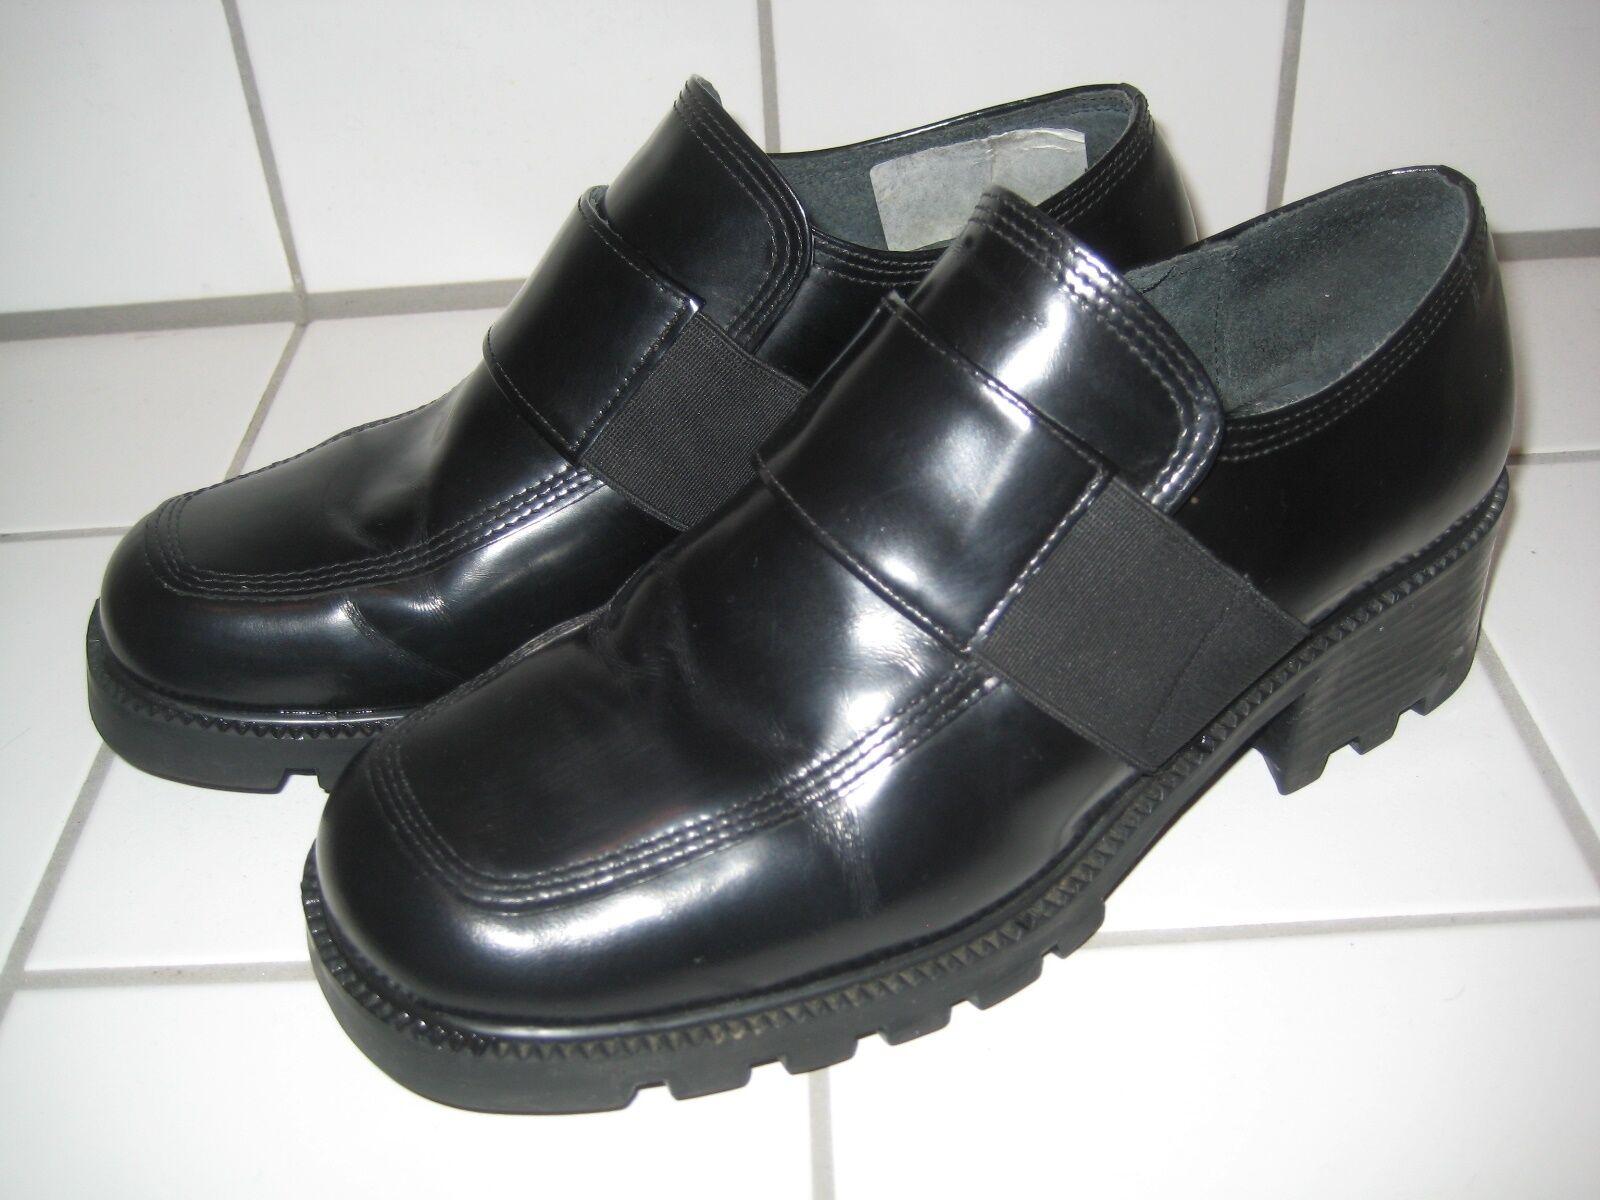 TAMARIS Halbschuhe Damen Schuhe Slipper Leder Blockabsatz Schwarz Gr. 38